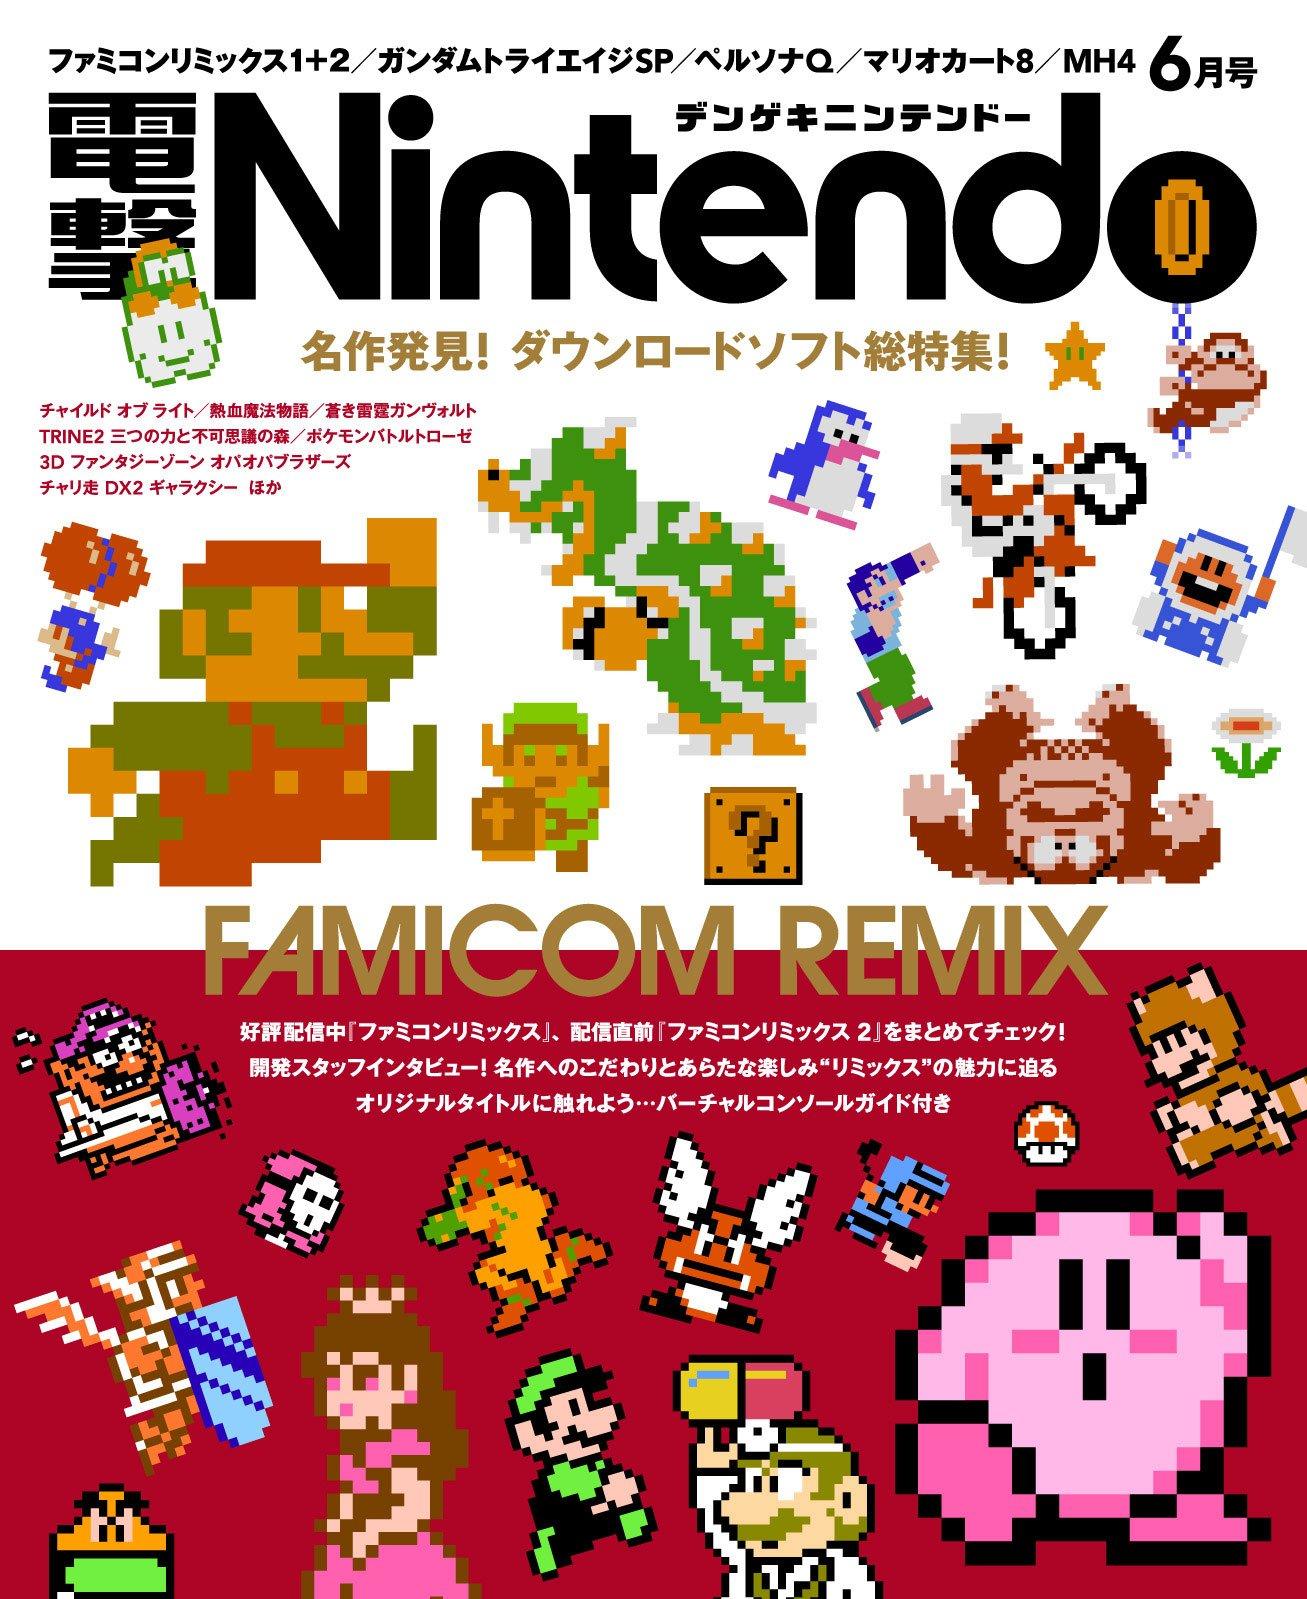 Dengeki Nintendo Issue 013 (June 2014)